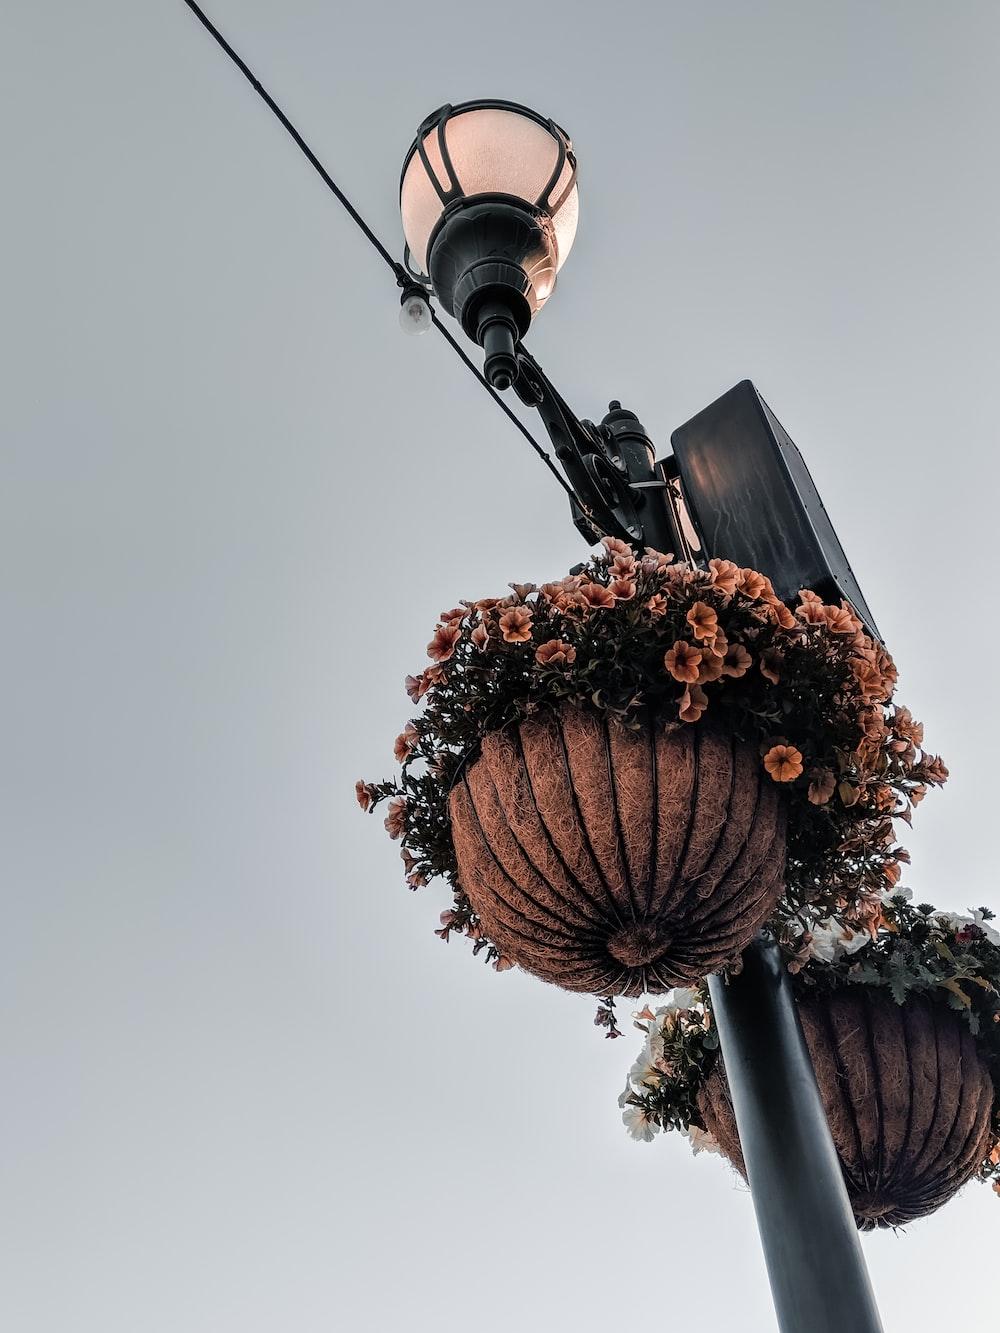 orange petaled flowers near lamp post